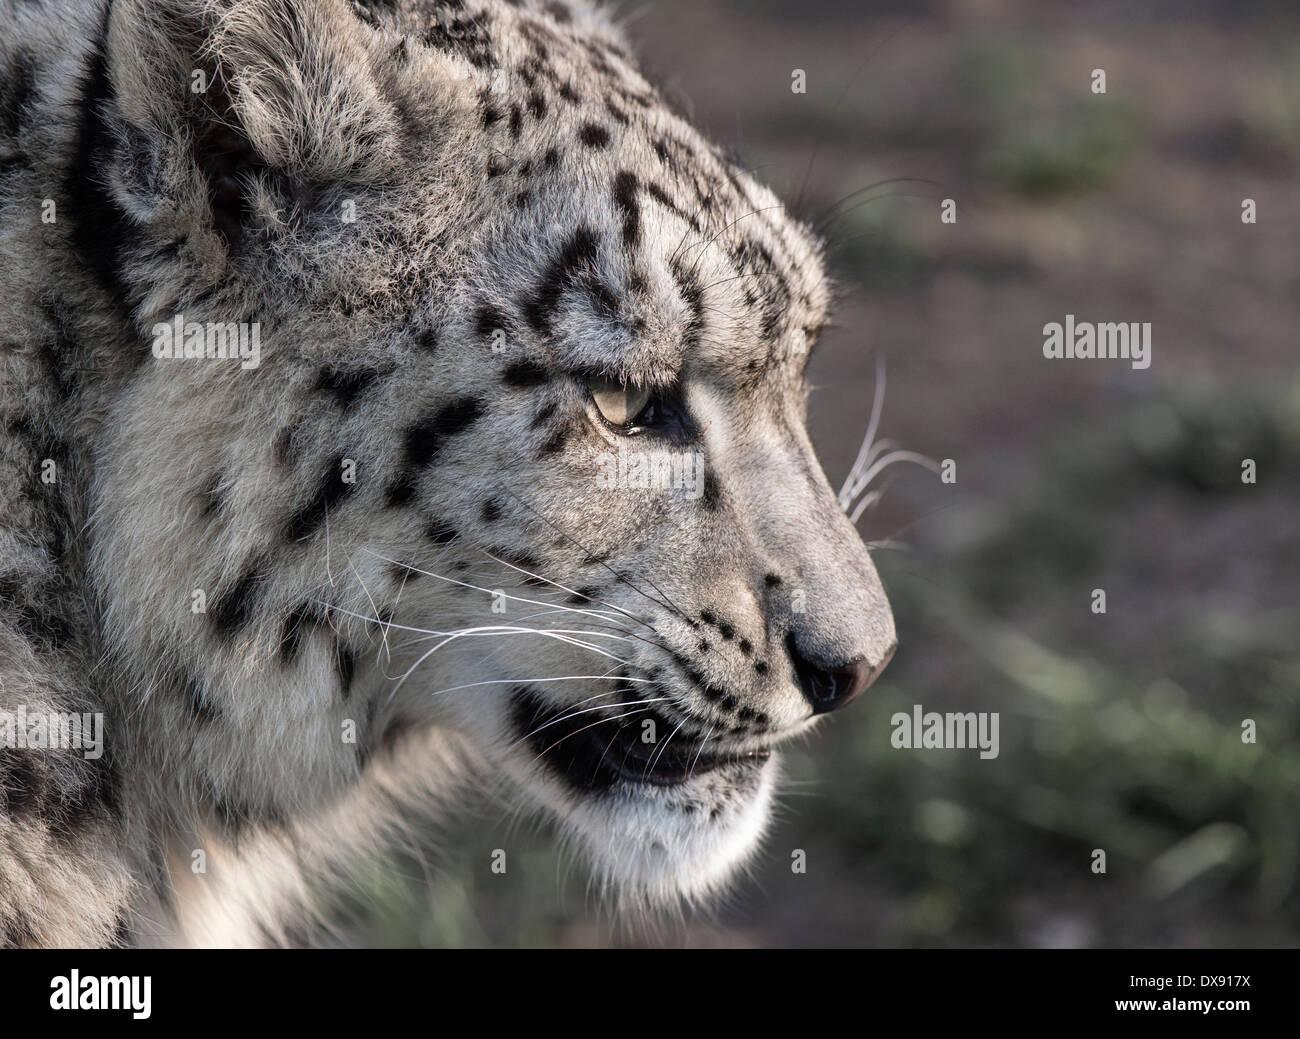 snow leopard snow leopard snow leopard face view predator HD wallpaper